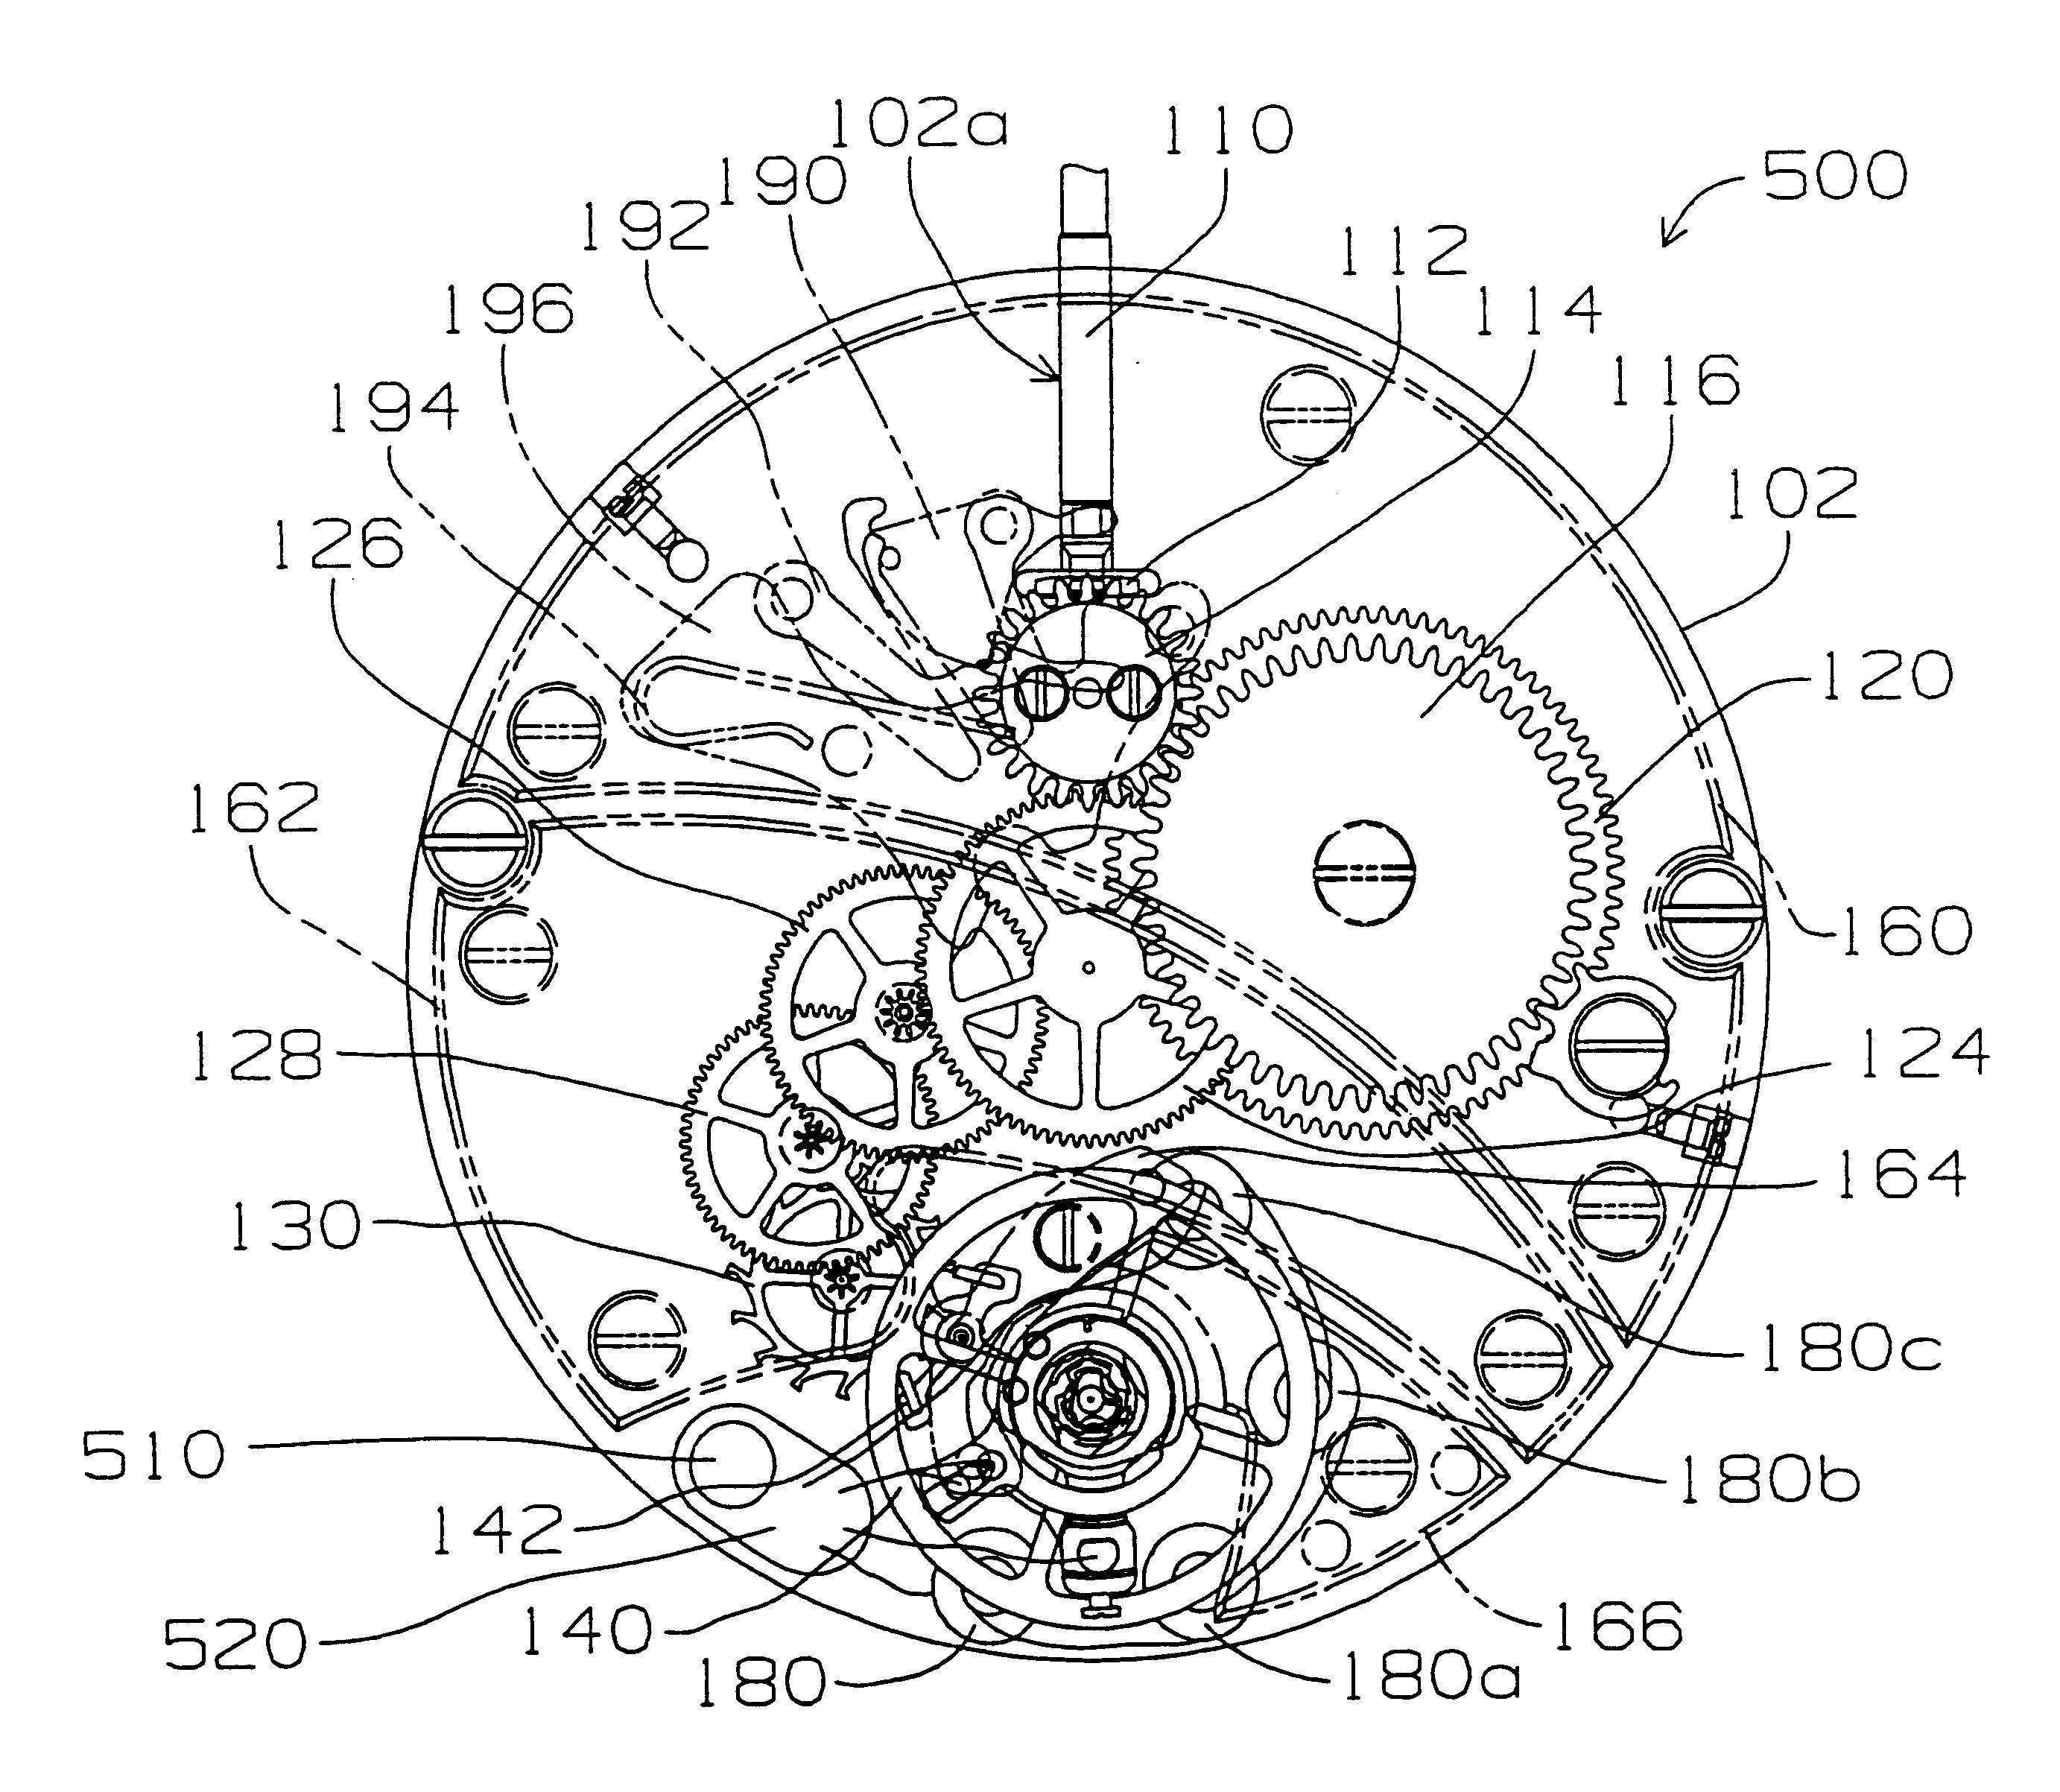 Mechanical Drawings